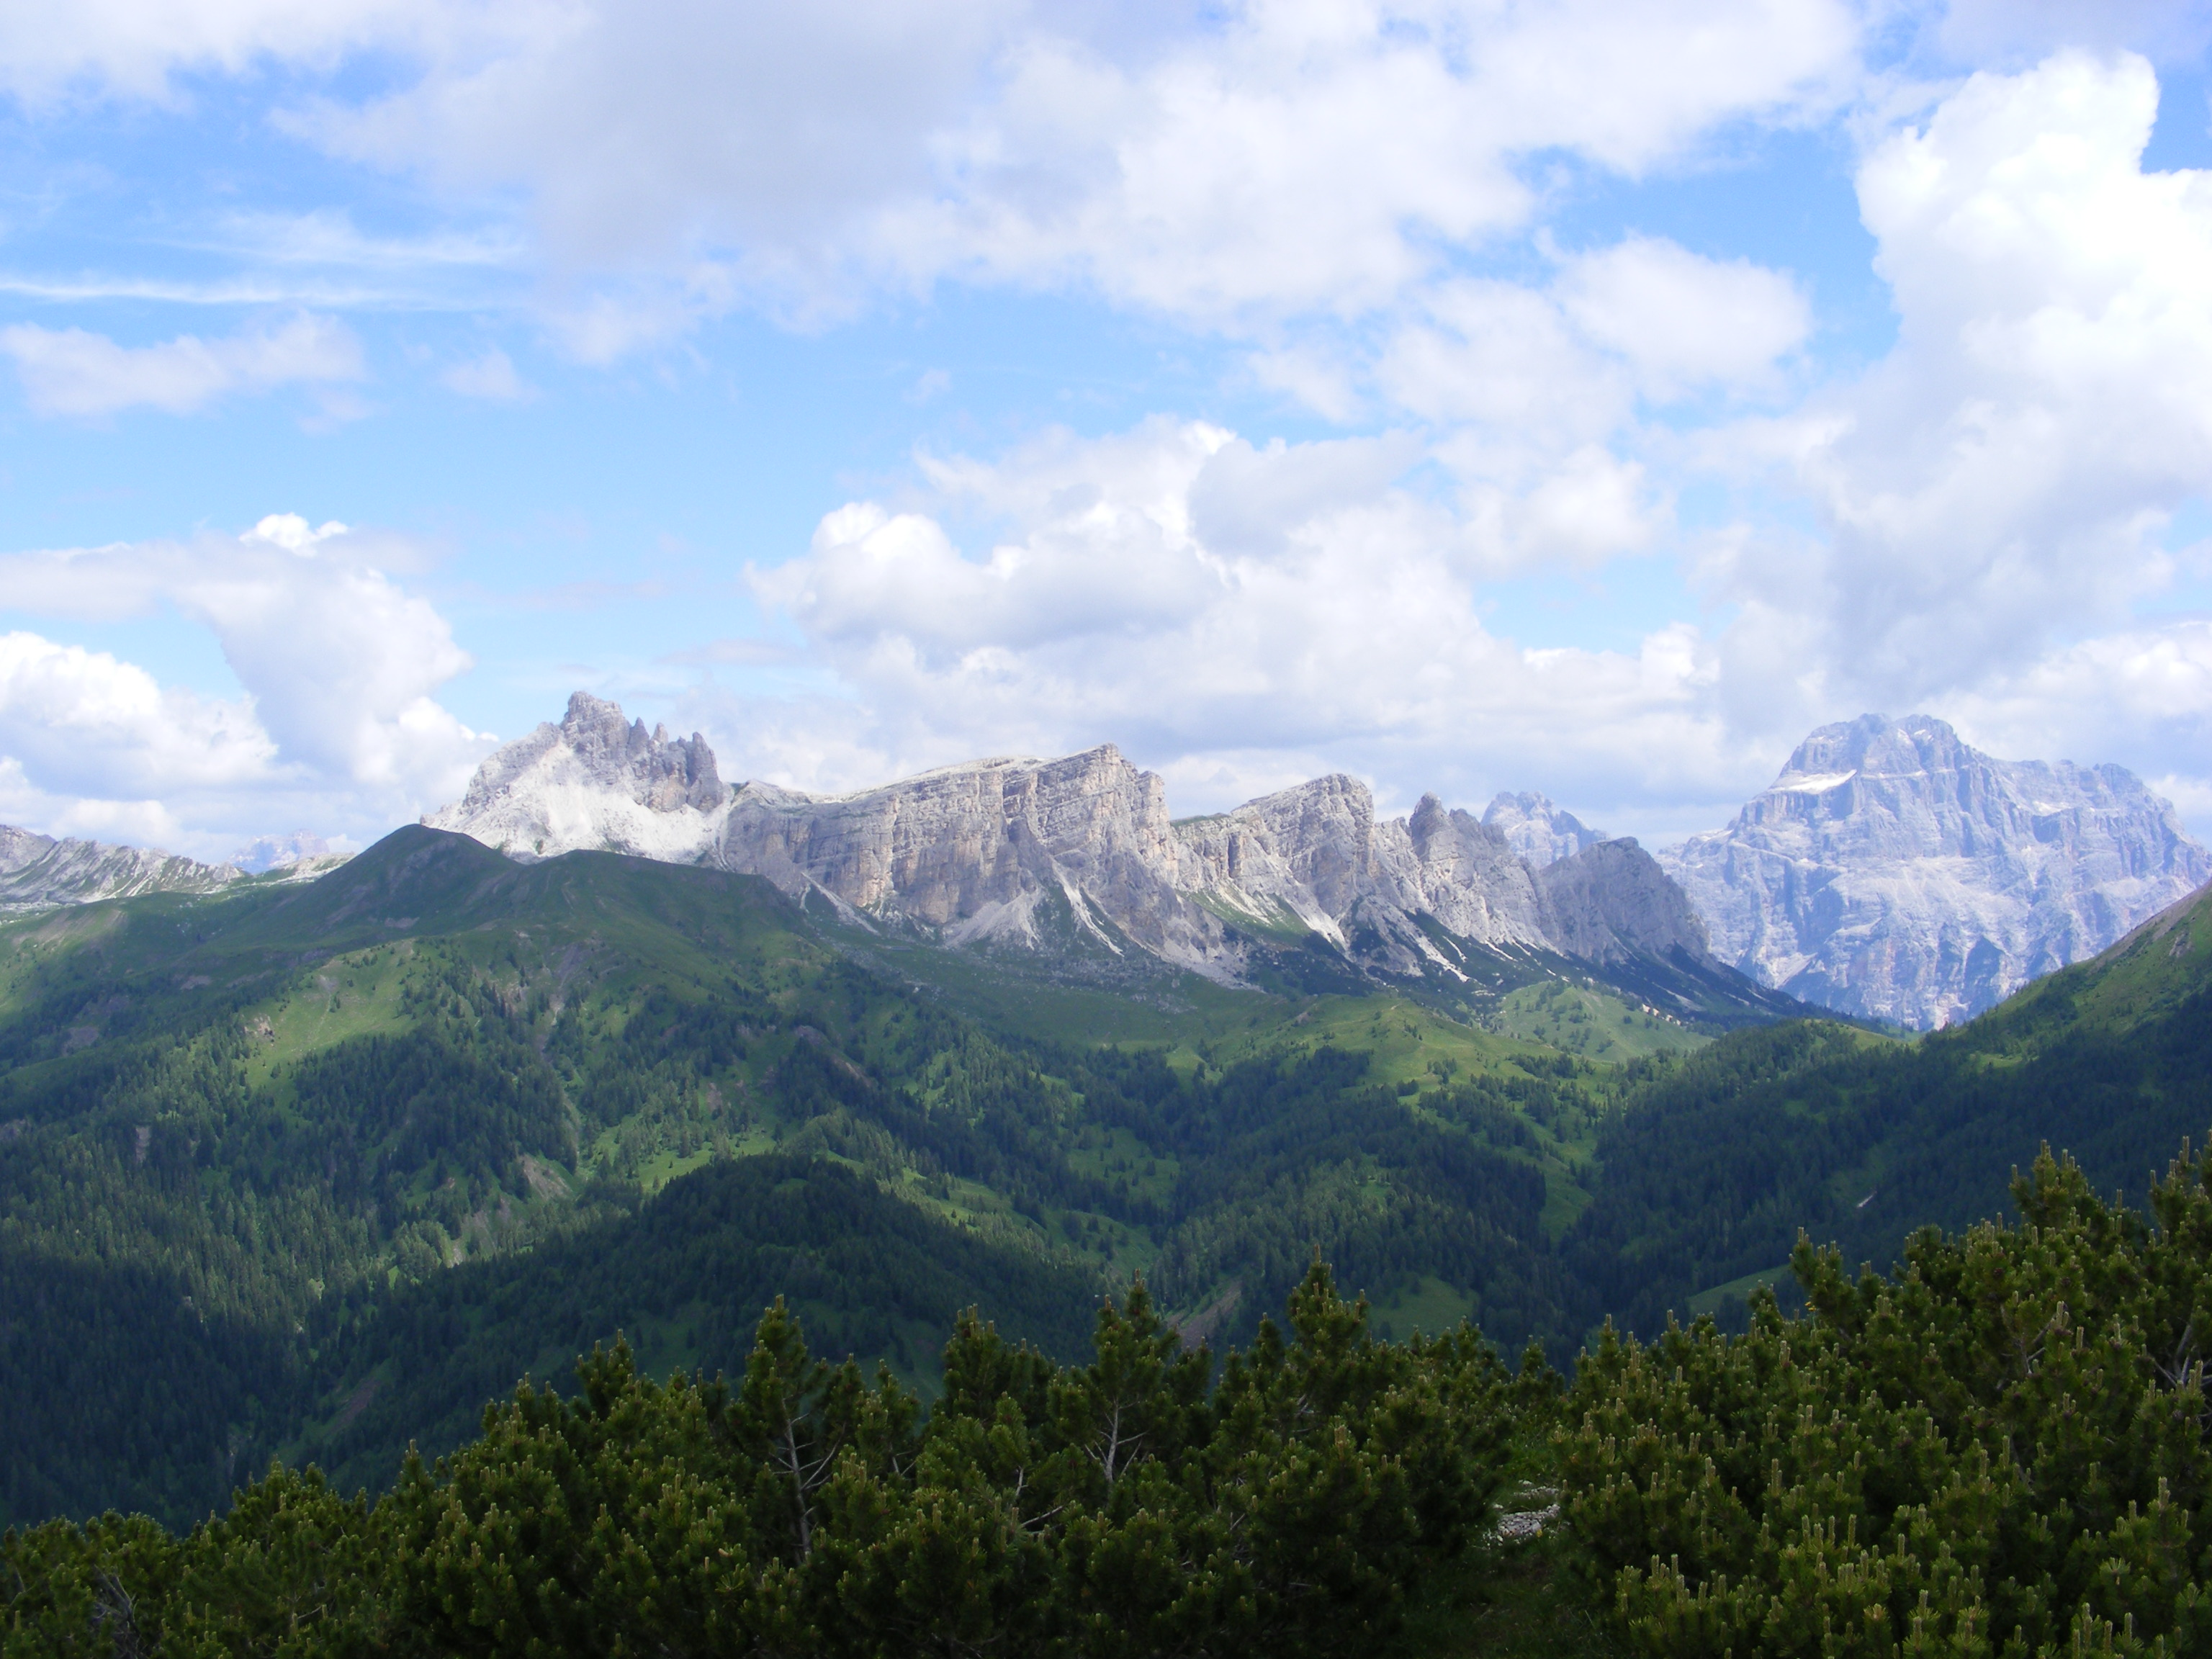 Valle di Mondeval, La Gusela e Lastoi del Formin